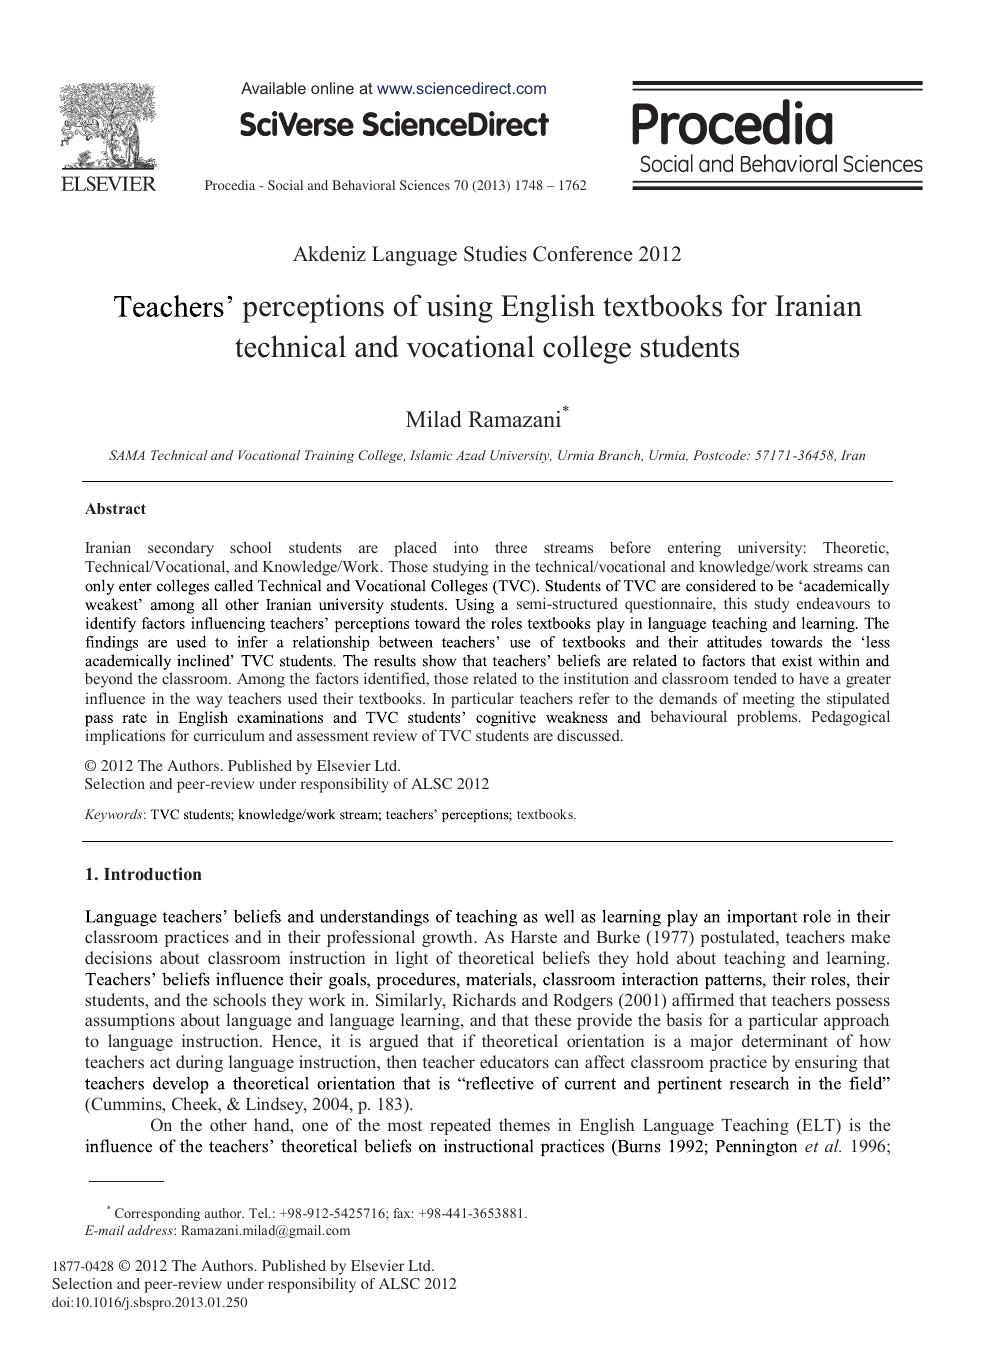 Teachers' Perceptions of Using English Textbooks for Iranian